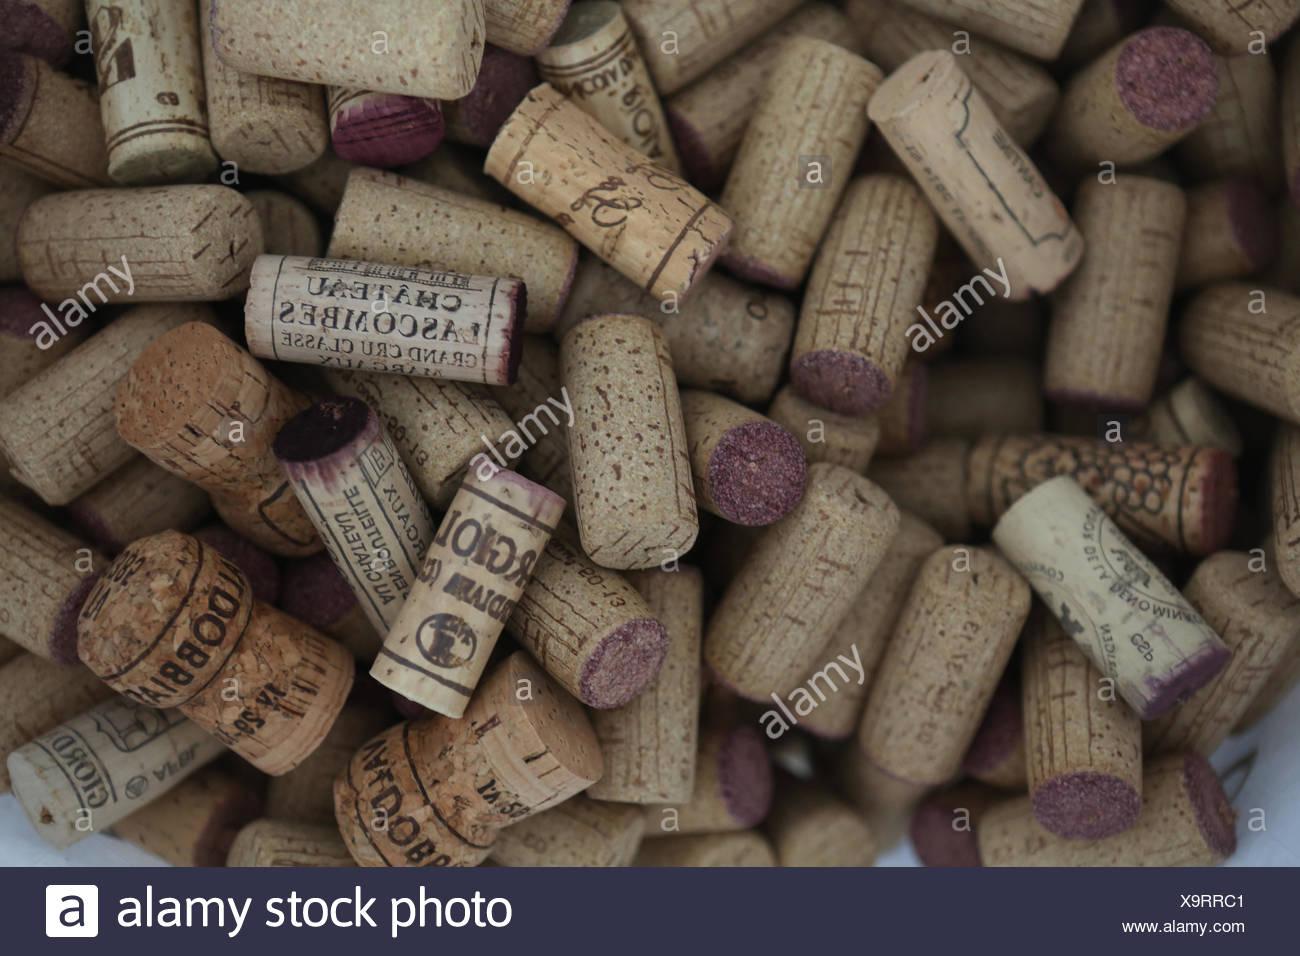 Zuerich, Switzerland, wine corks - Stock Image